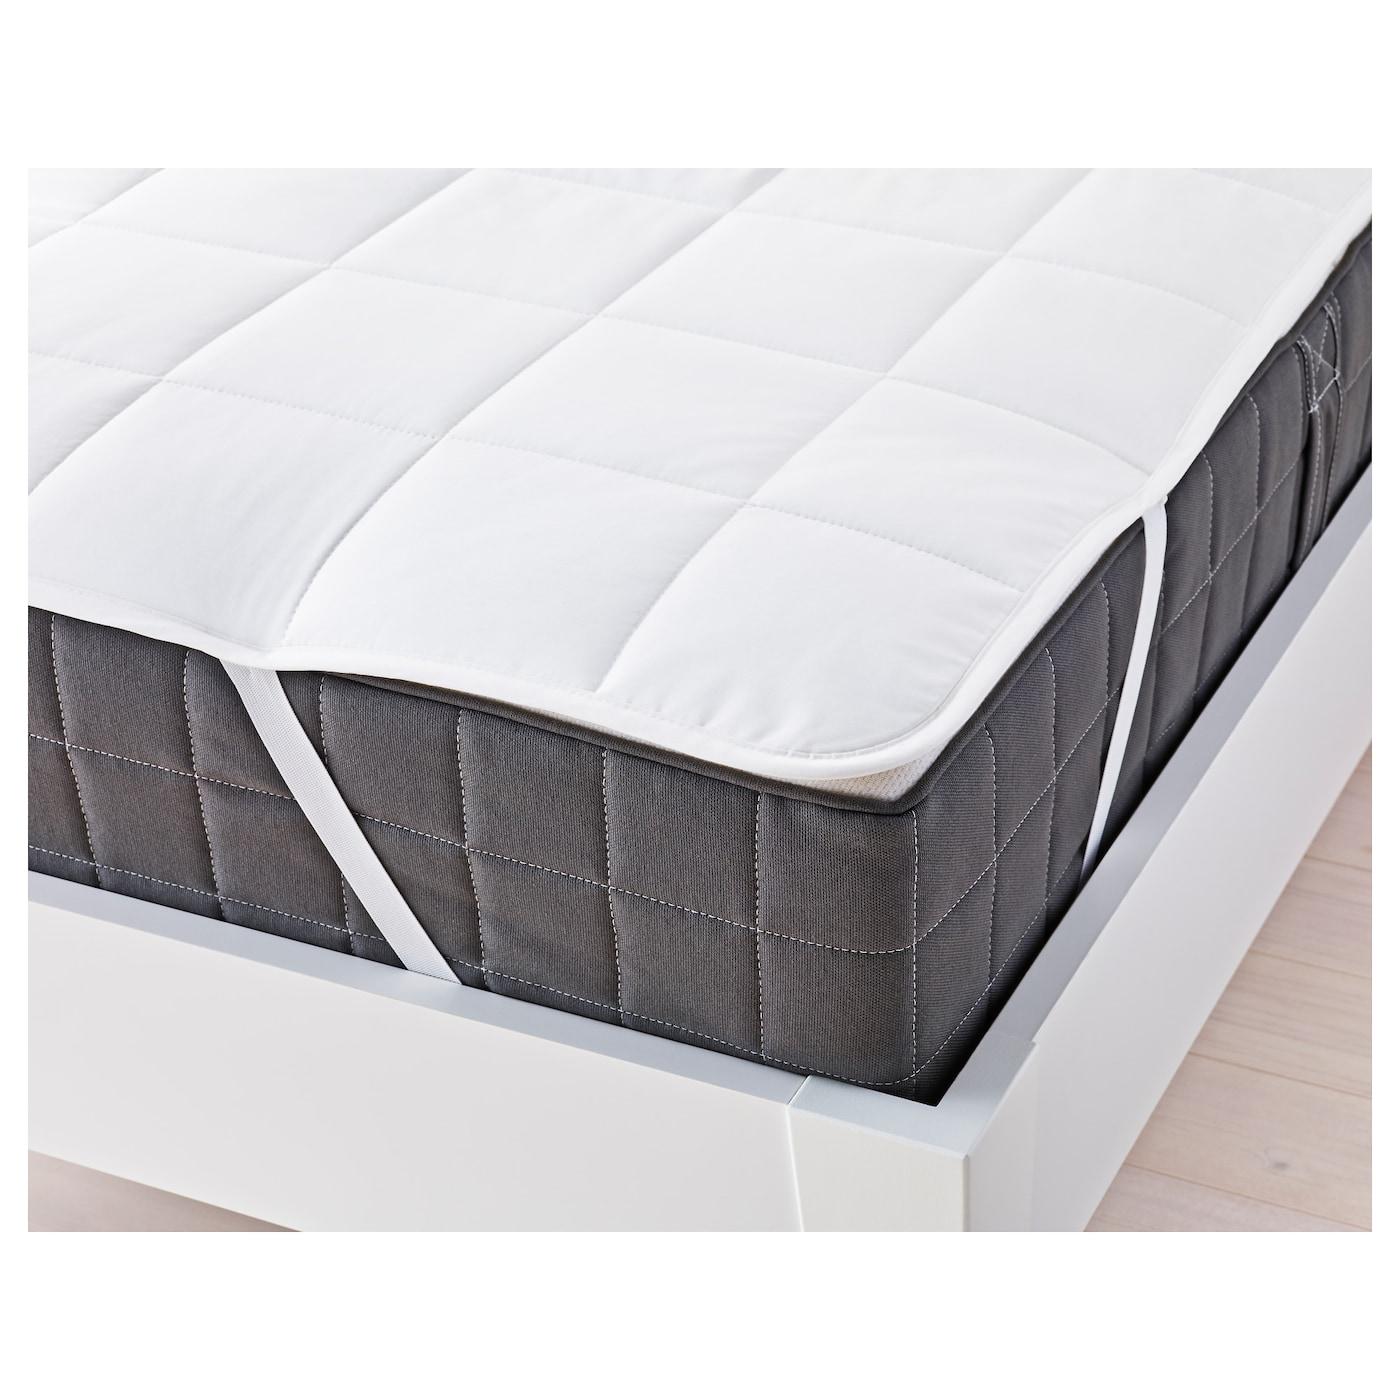 mattress gb ikea protectors pillow textiles topper rugs protector products en rosendun